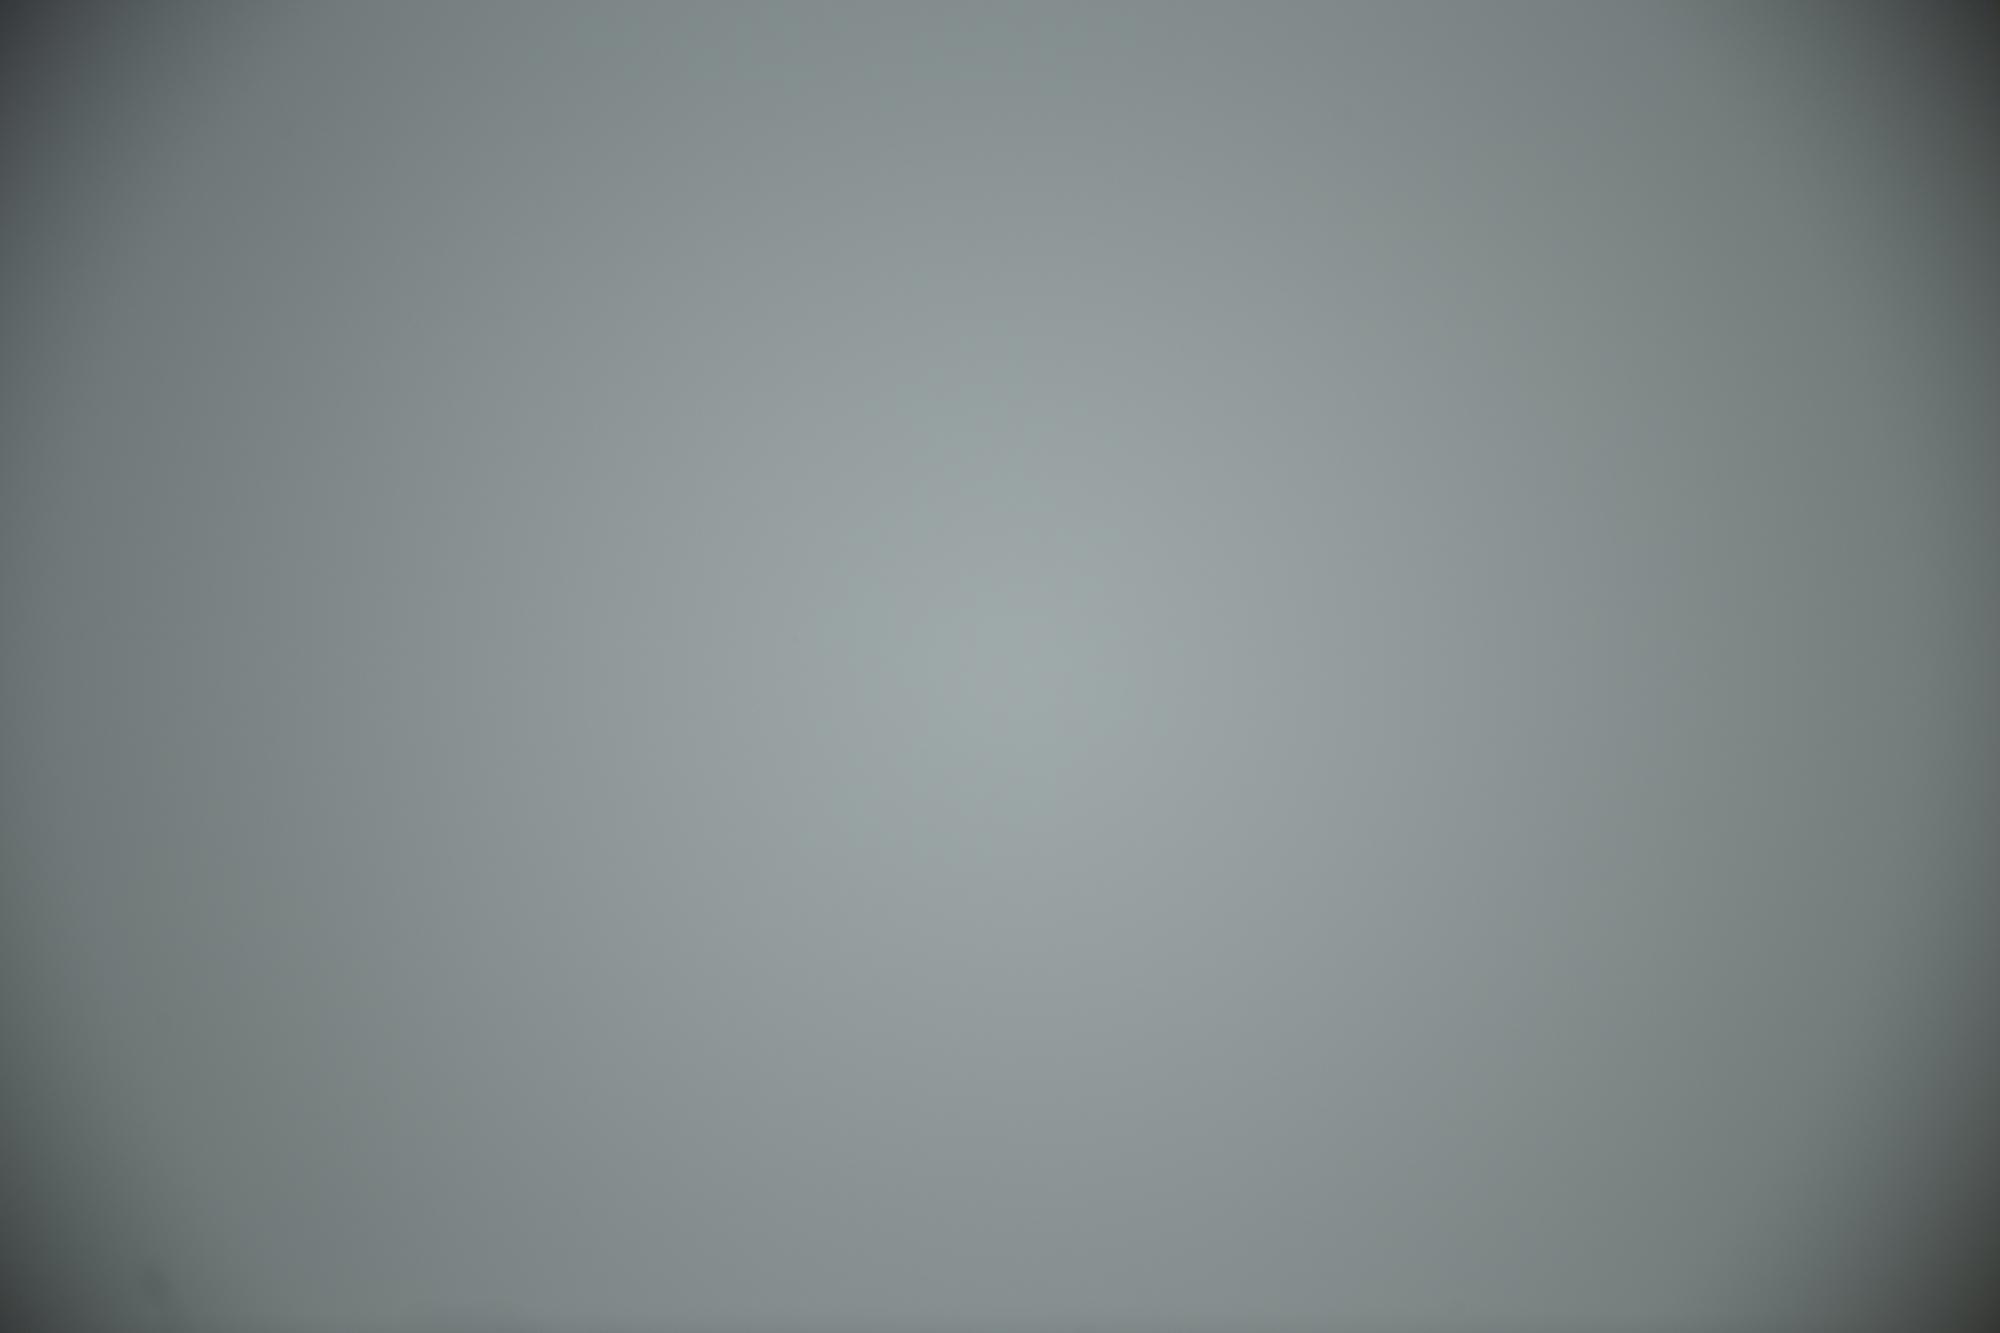 f:id:snct-astro:20200101225433j:plain